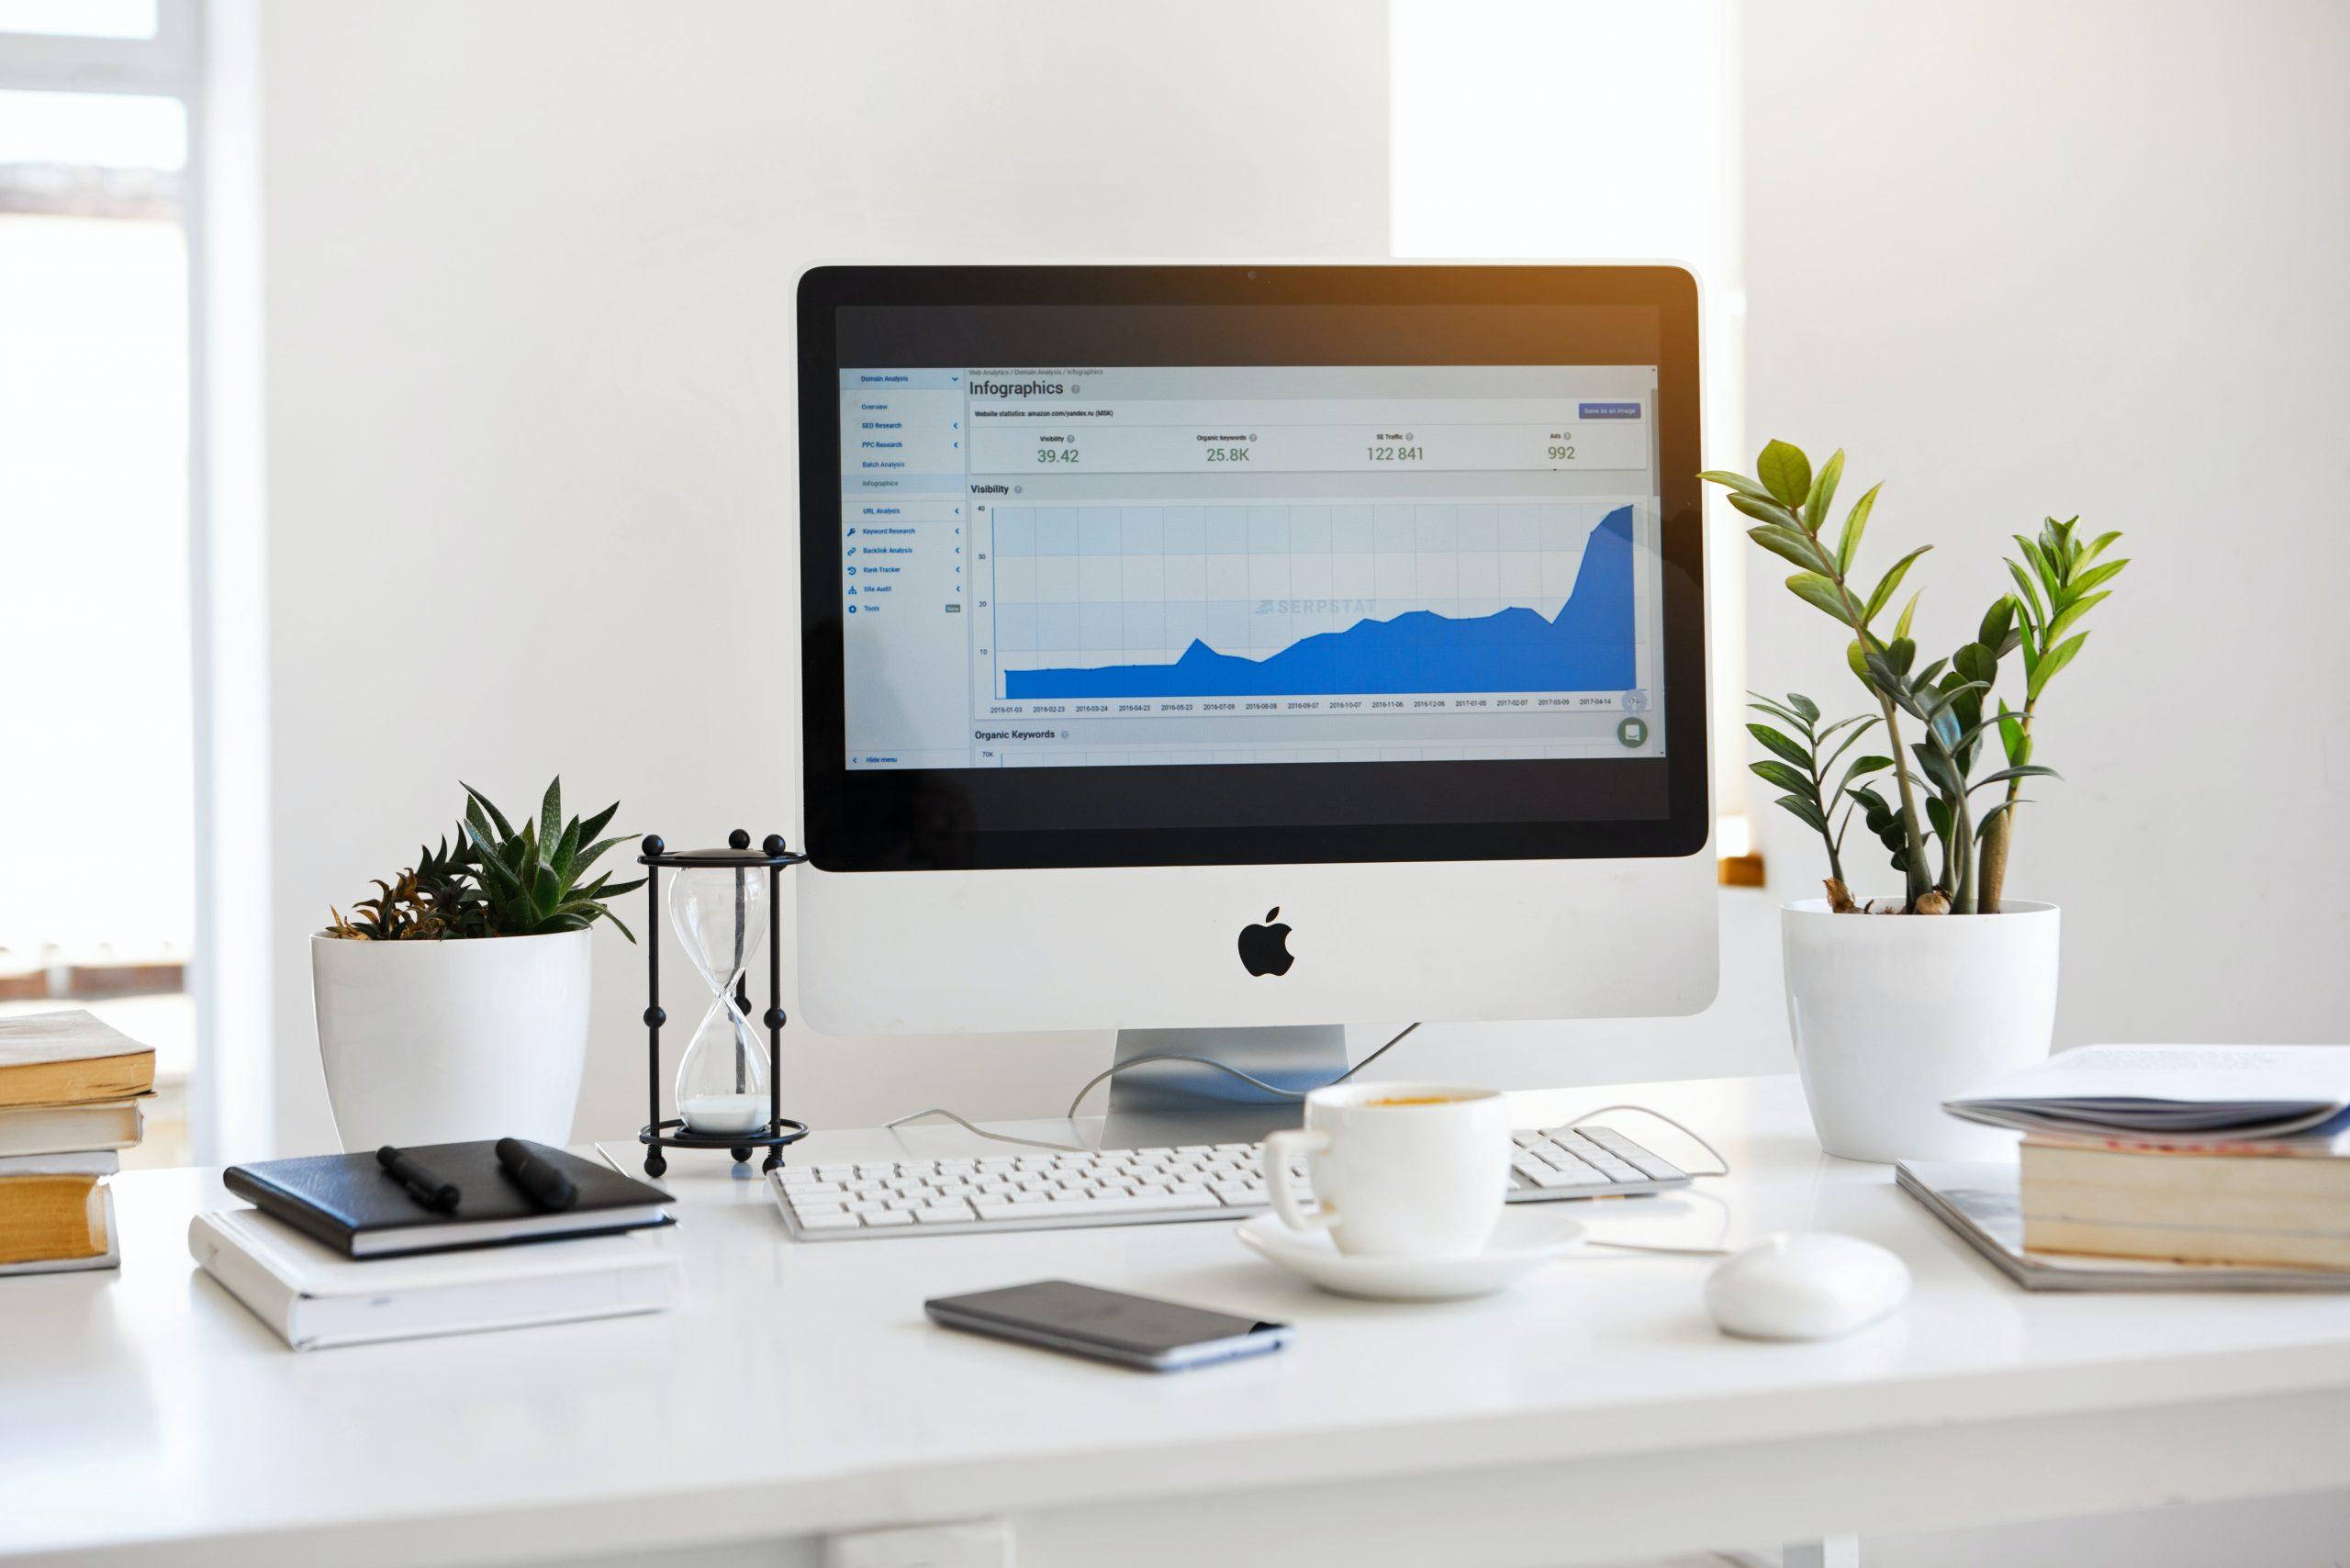 Online Διαφήμιση: 4 τρόποι για αύξηση πωλήσεων www.bngroup.gr